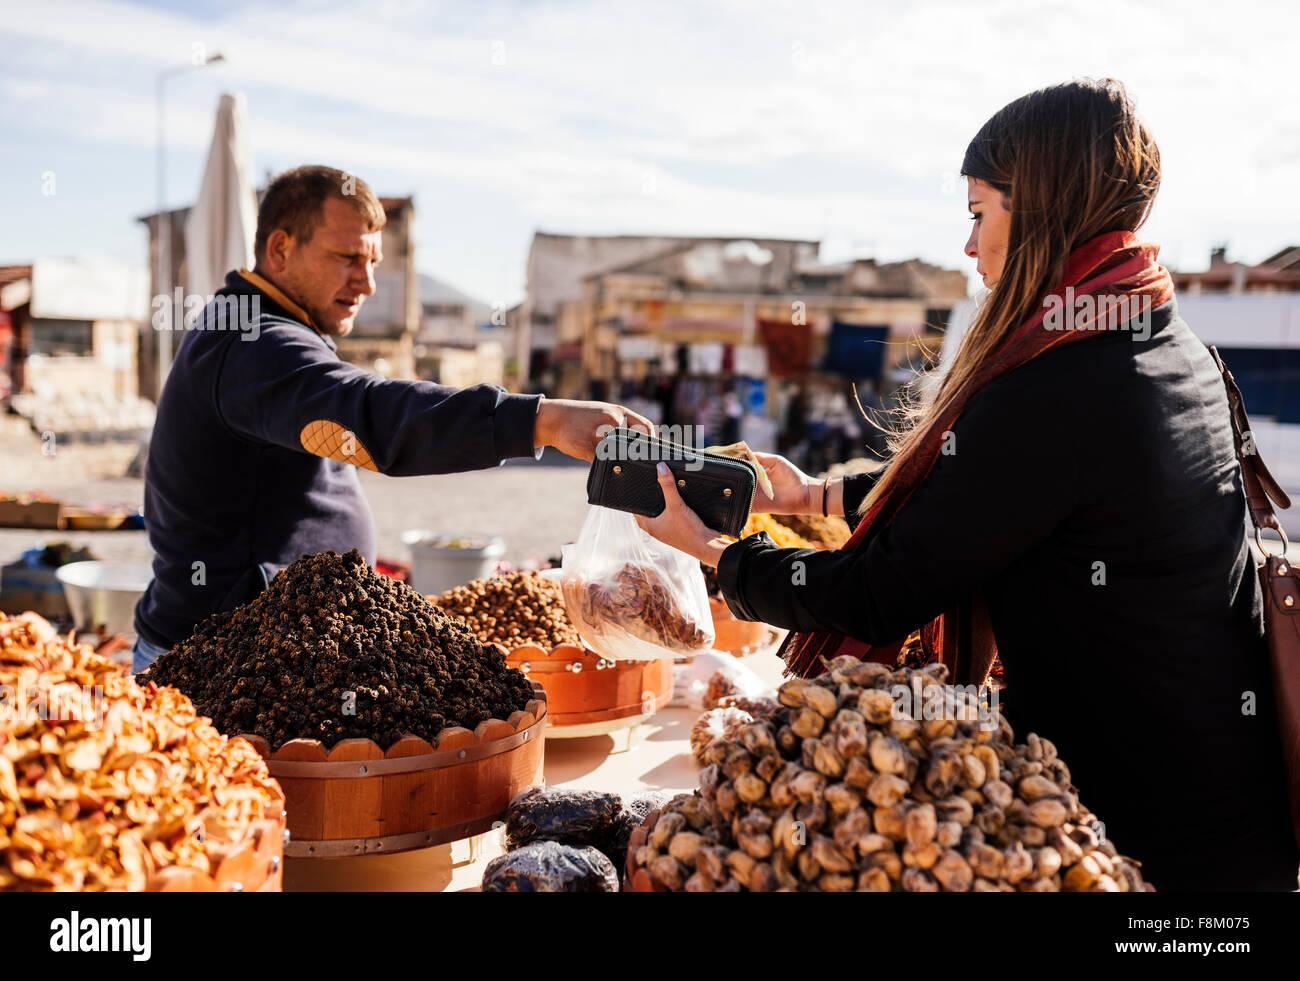 Young woman buying dried fruits, Uçhisar, Cappadocia, Anatolia Region, Turkey - Stock Image